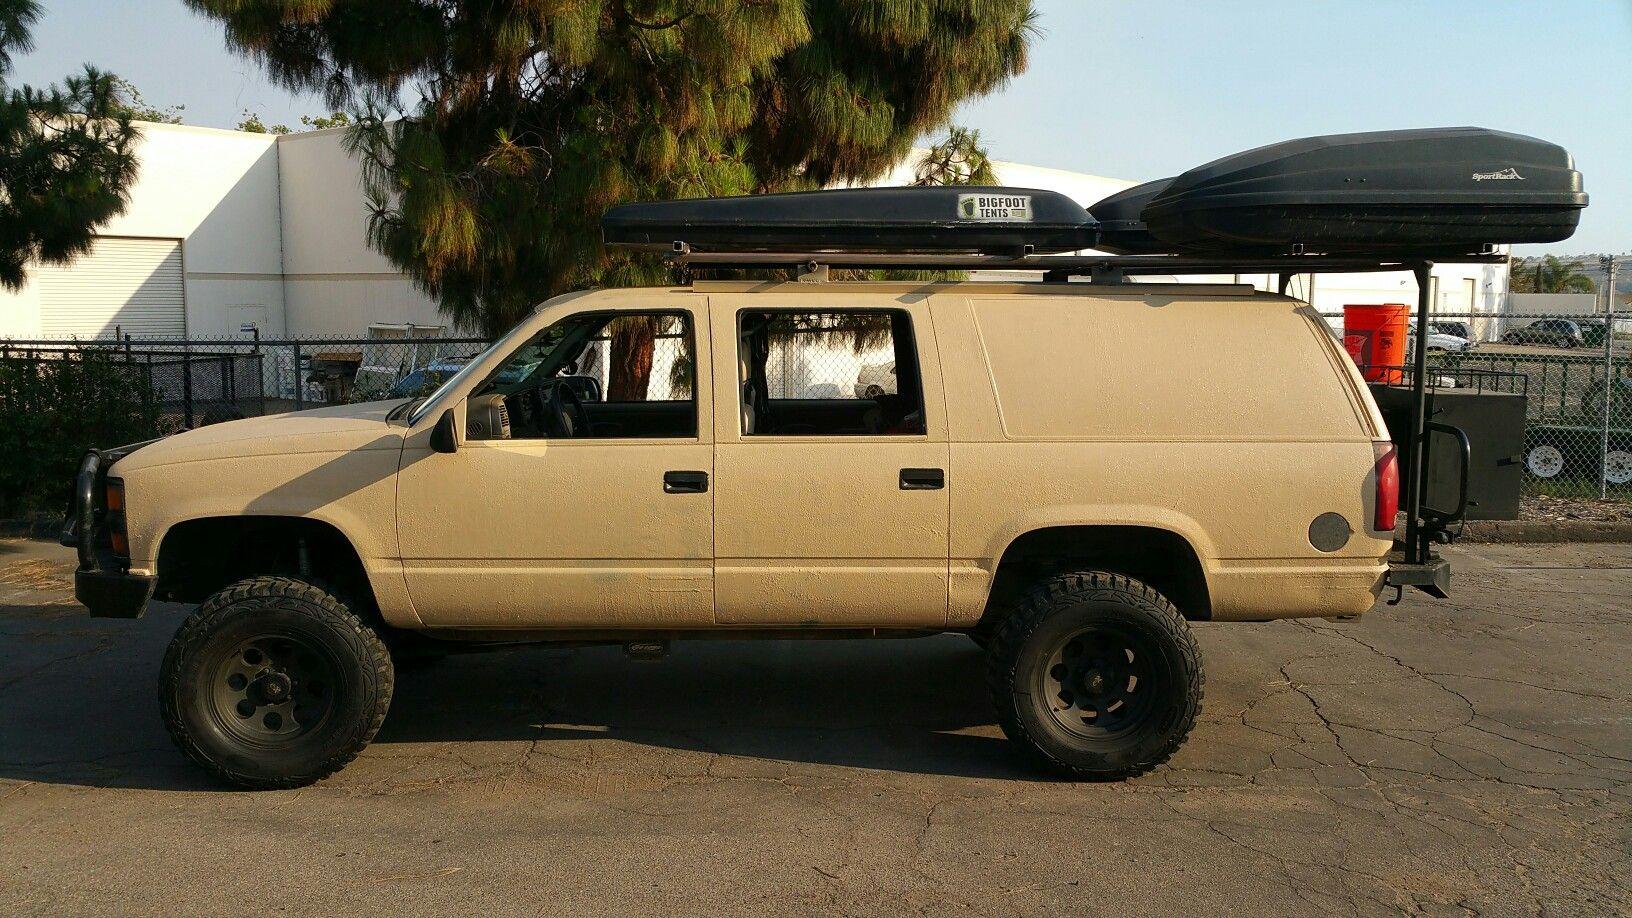 4x4 Chevy Suburban Chevy Suburban Chevrolet Suburban Truck Tent